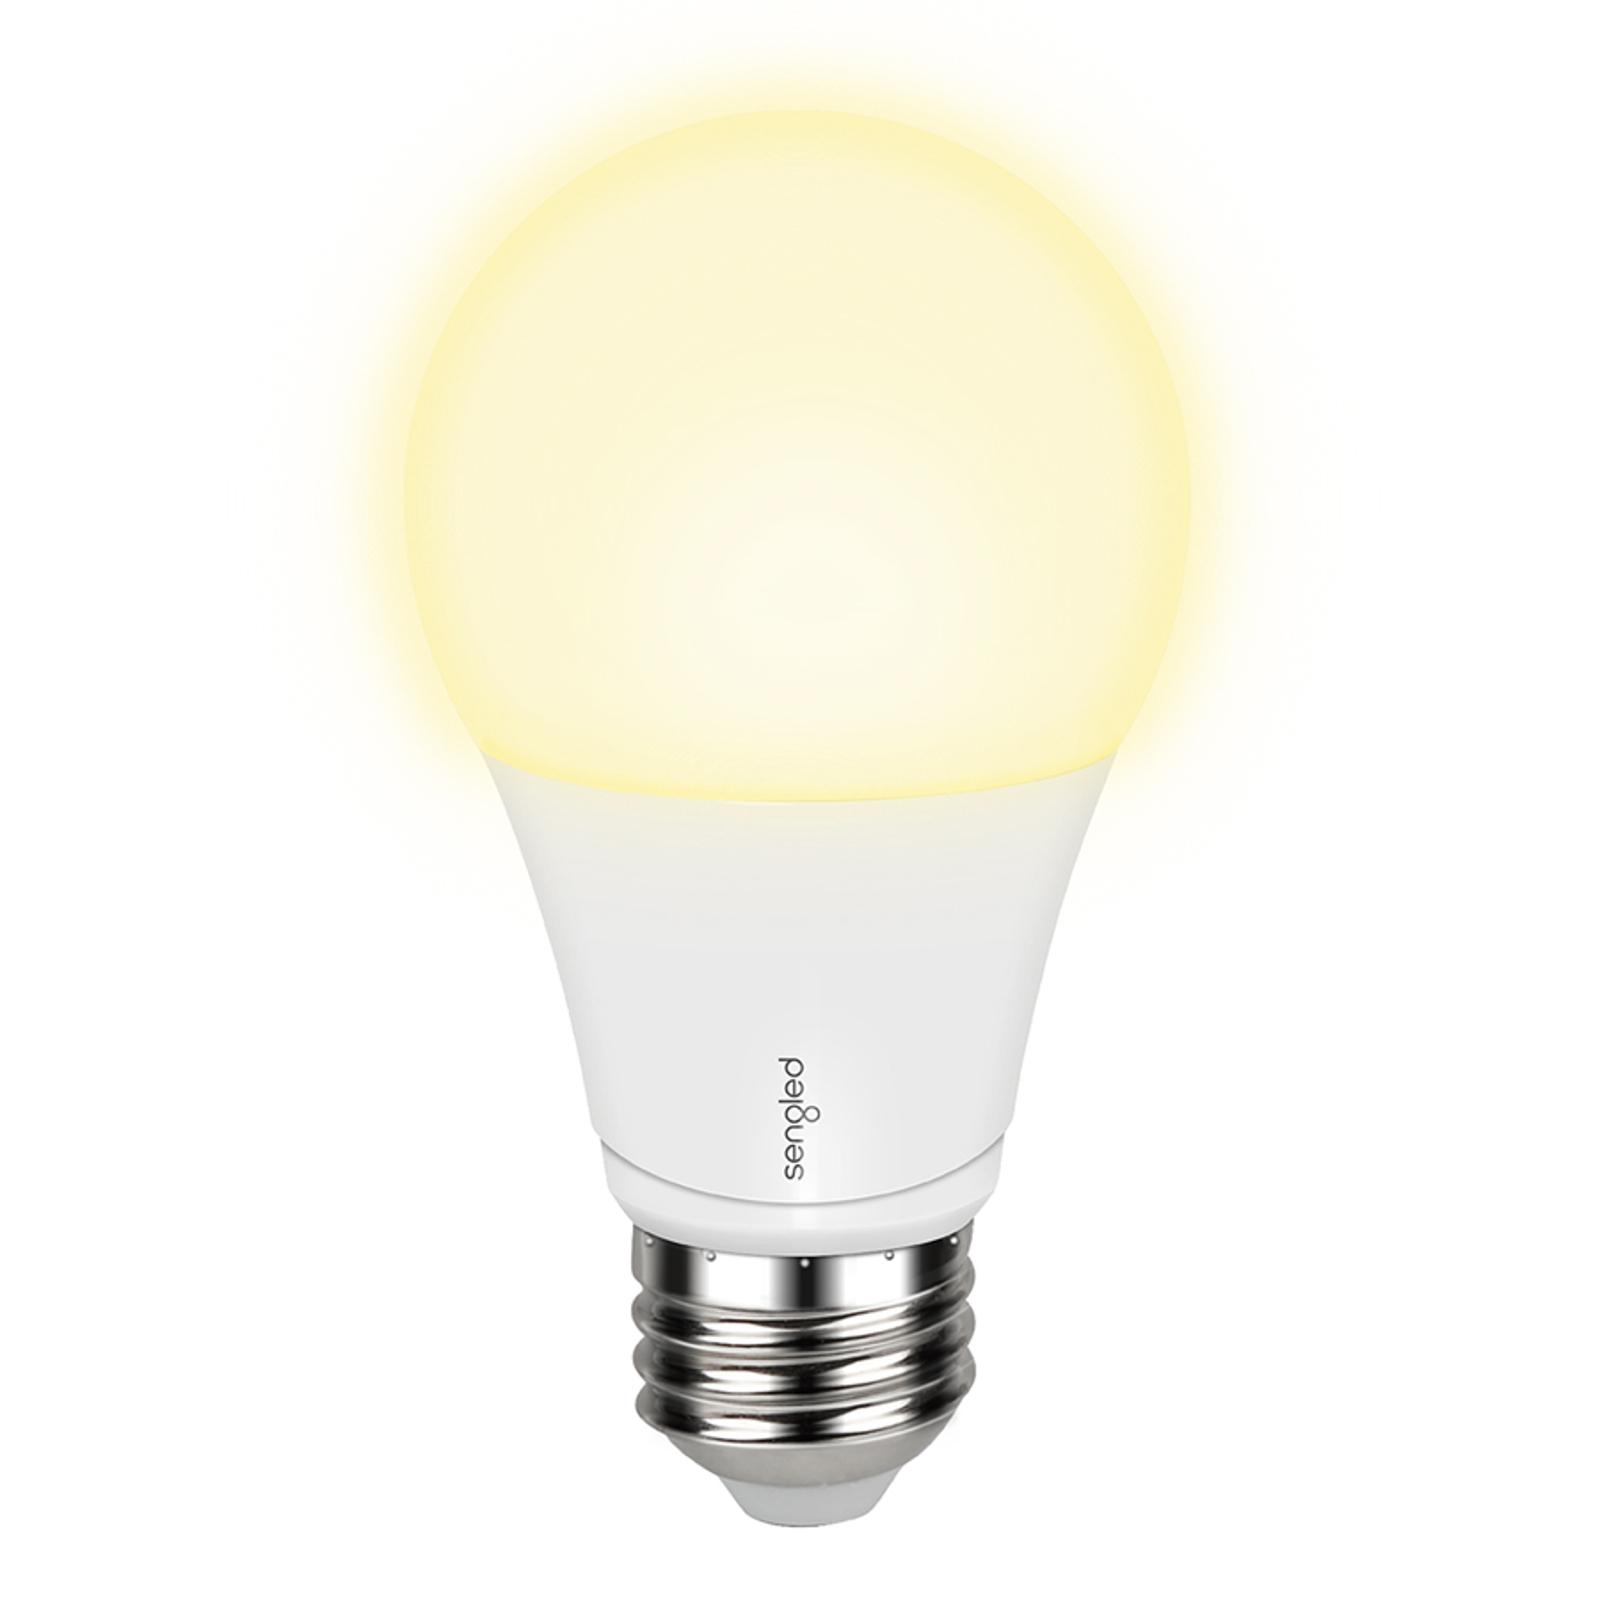 Sengled Mood żarówka LED, Tunable White, E27 9W